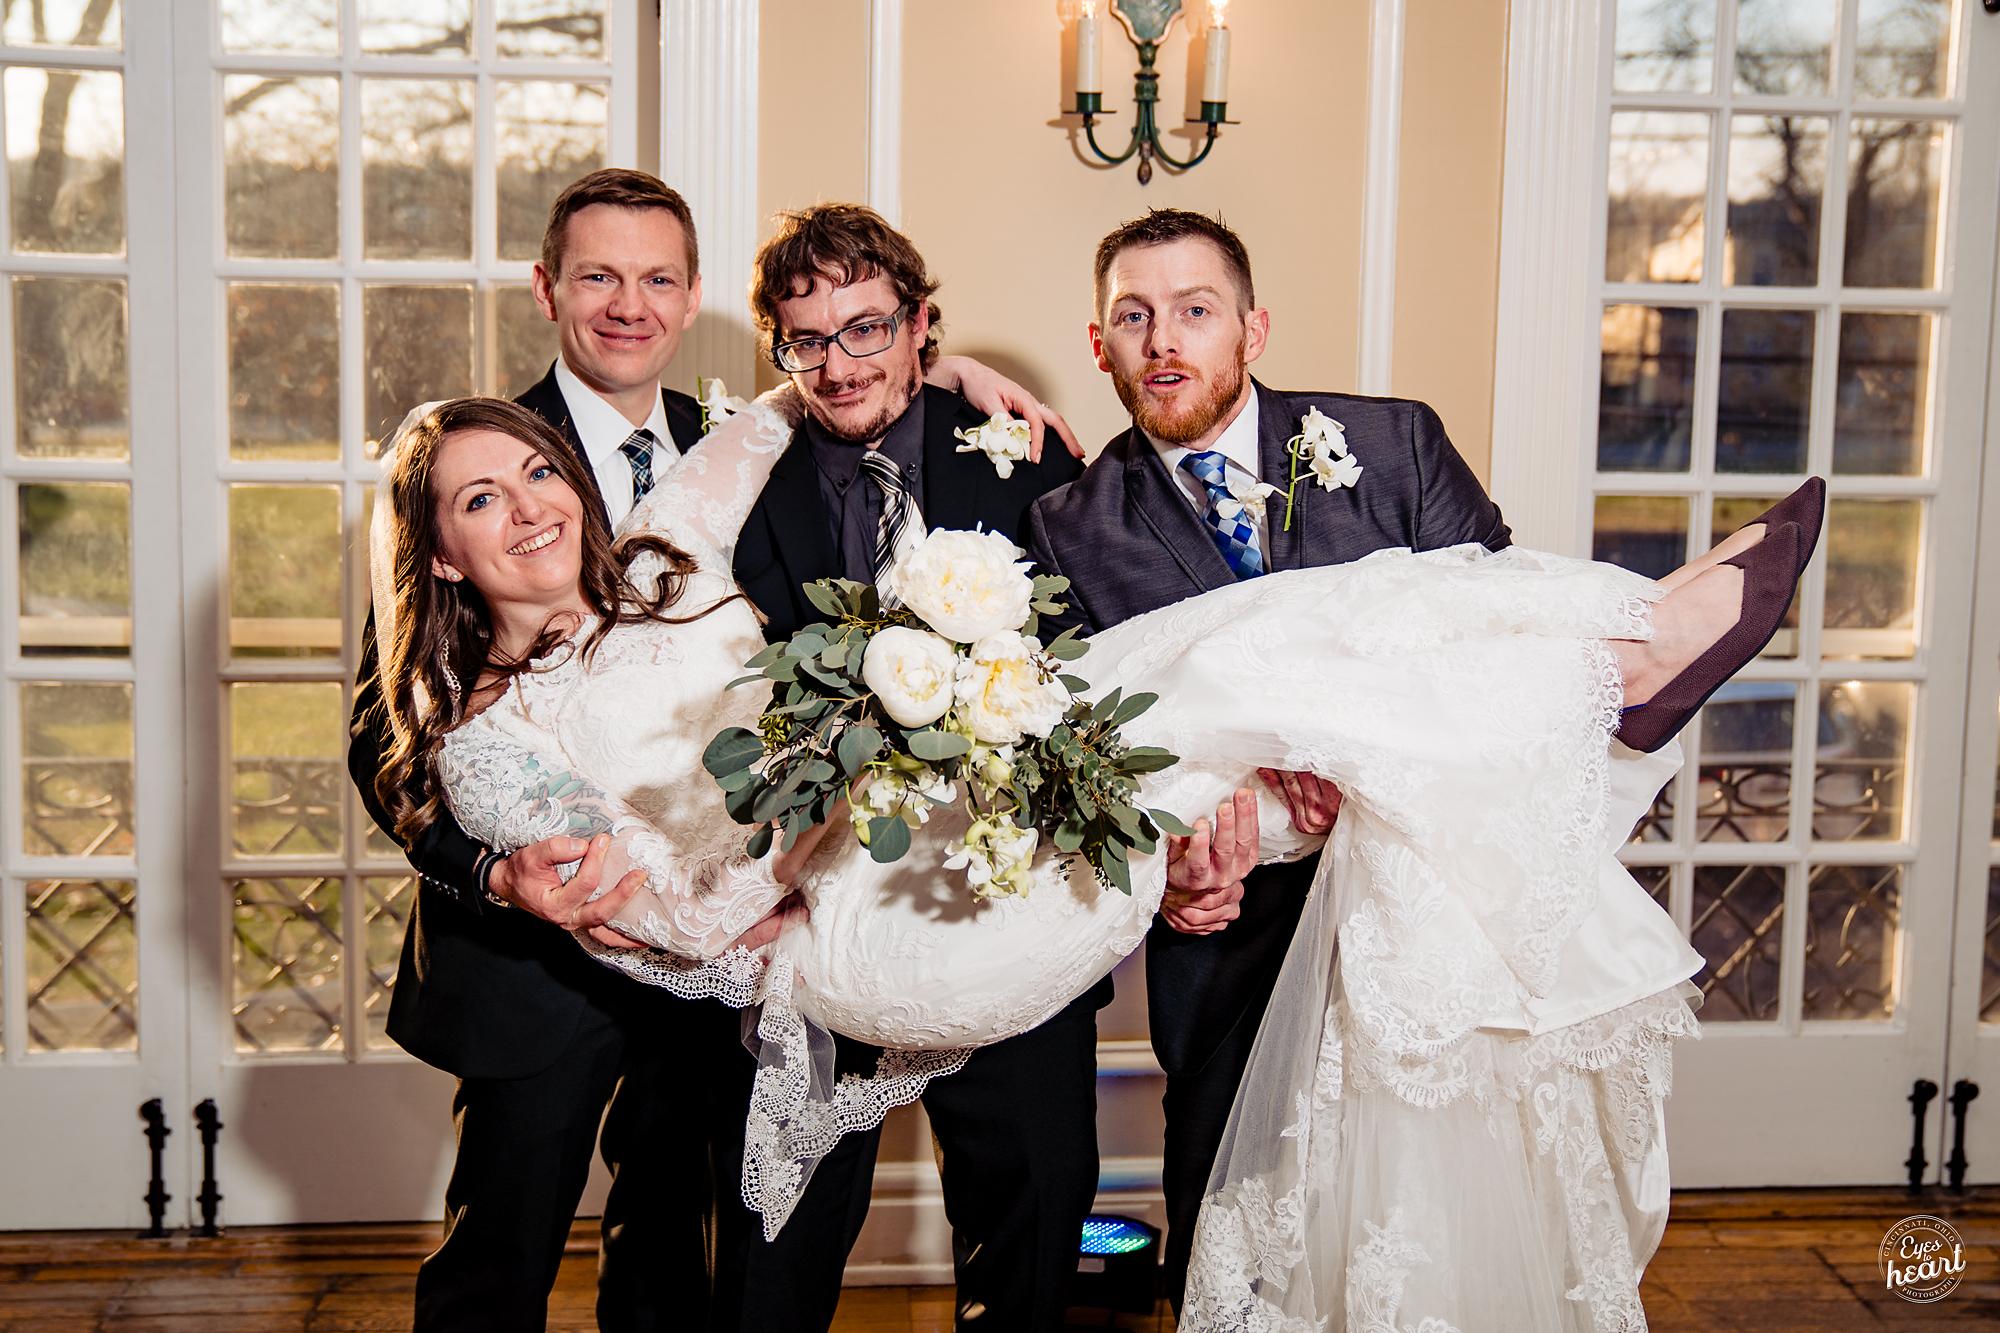 Oxford-Community-Arts-Center-Wedding-Photography-14.jpg